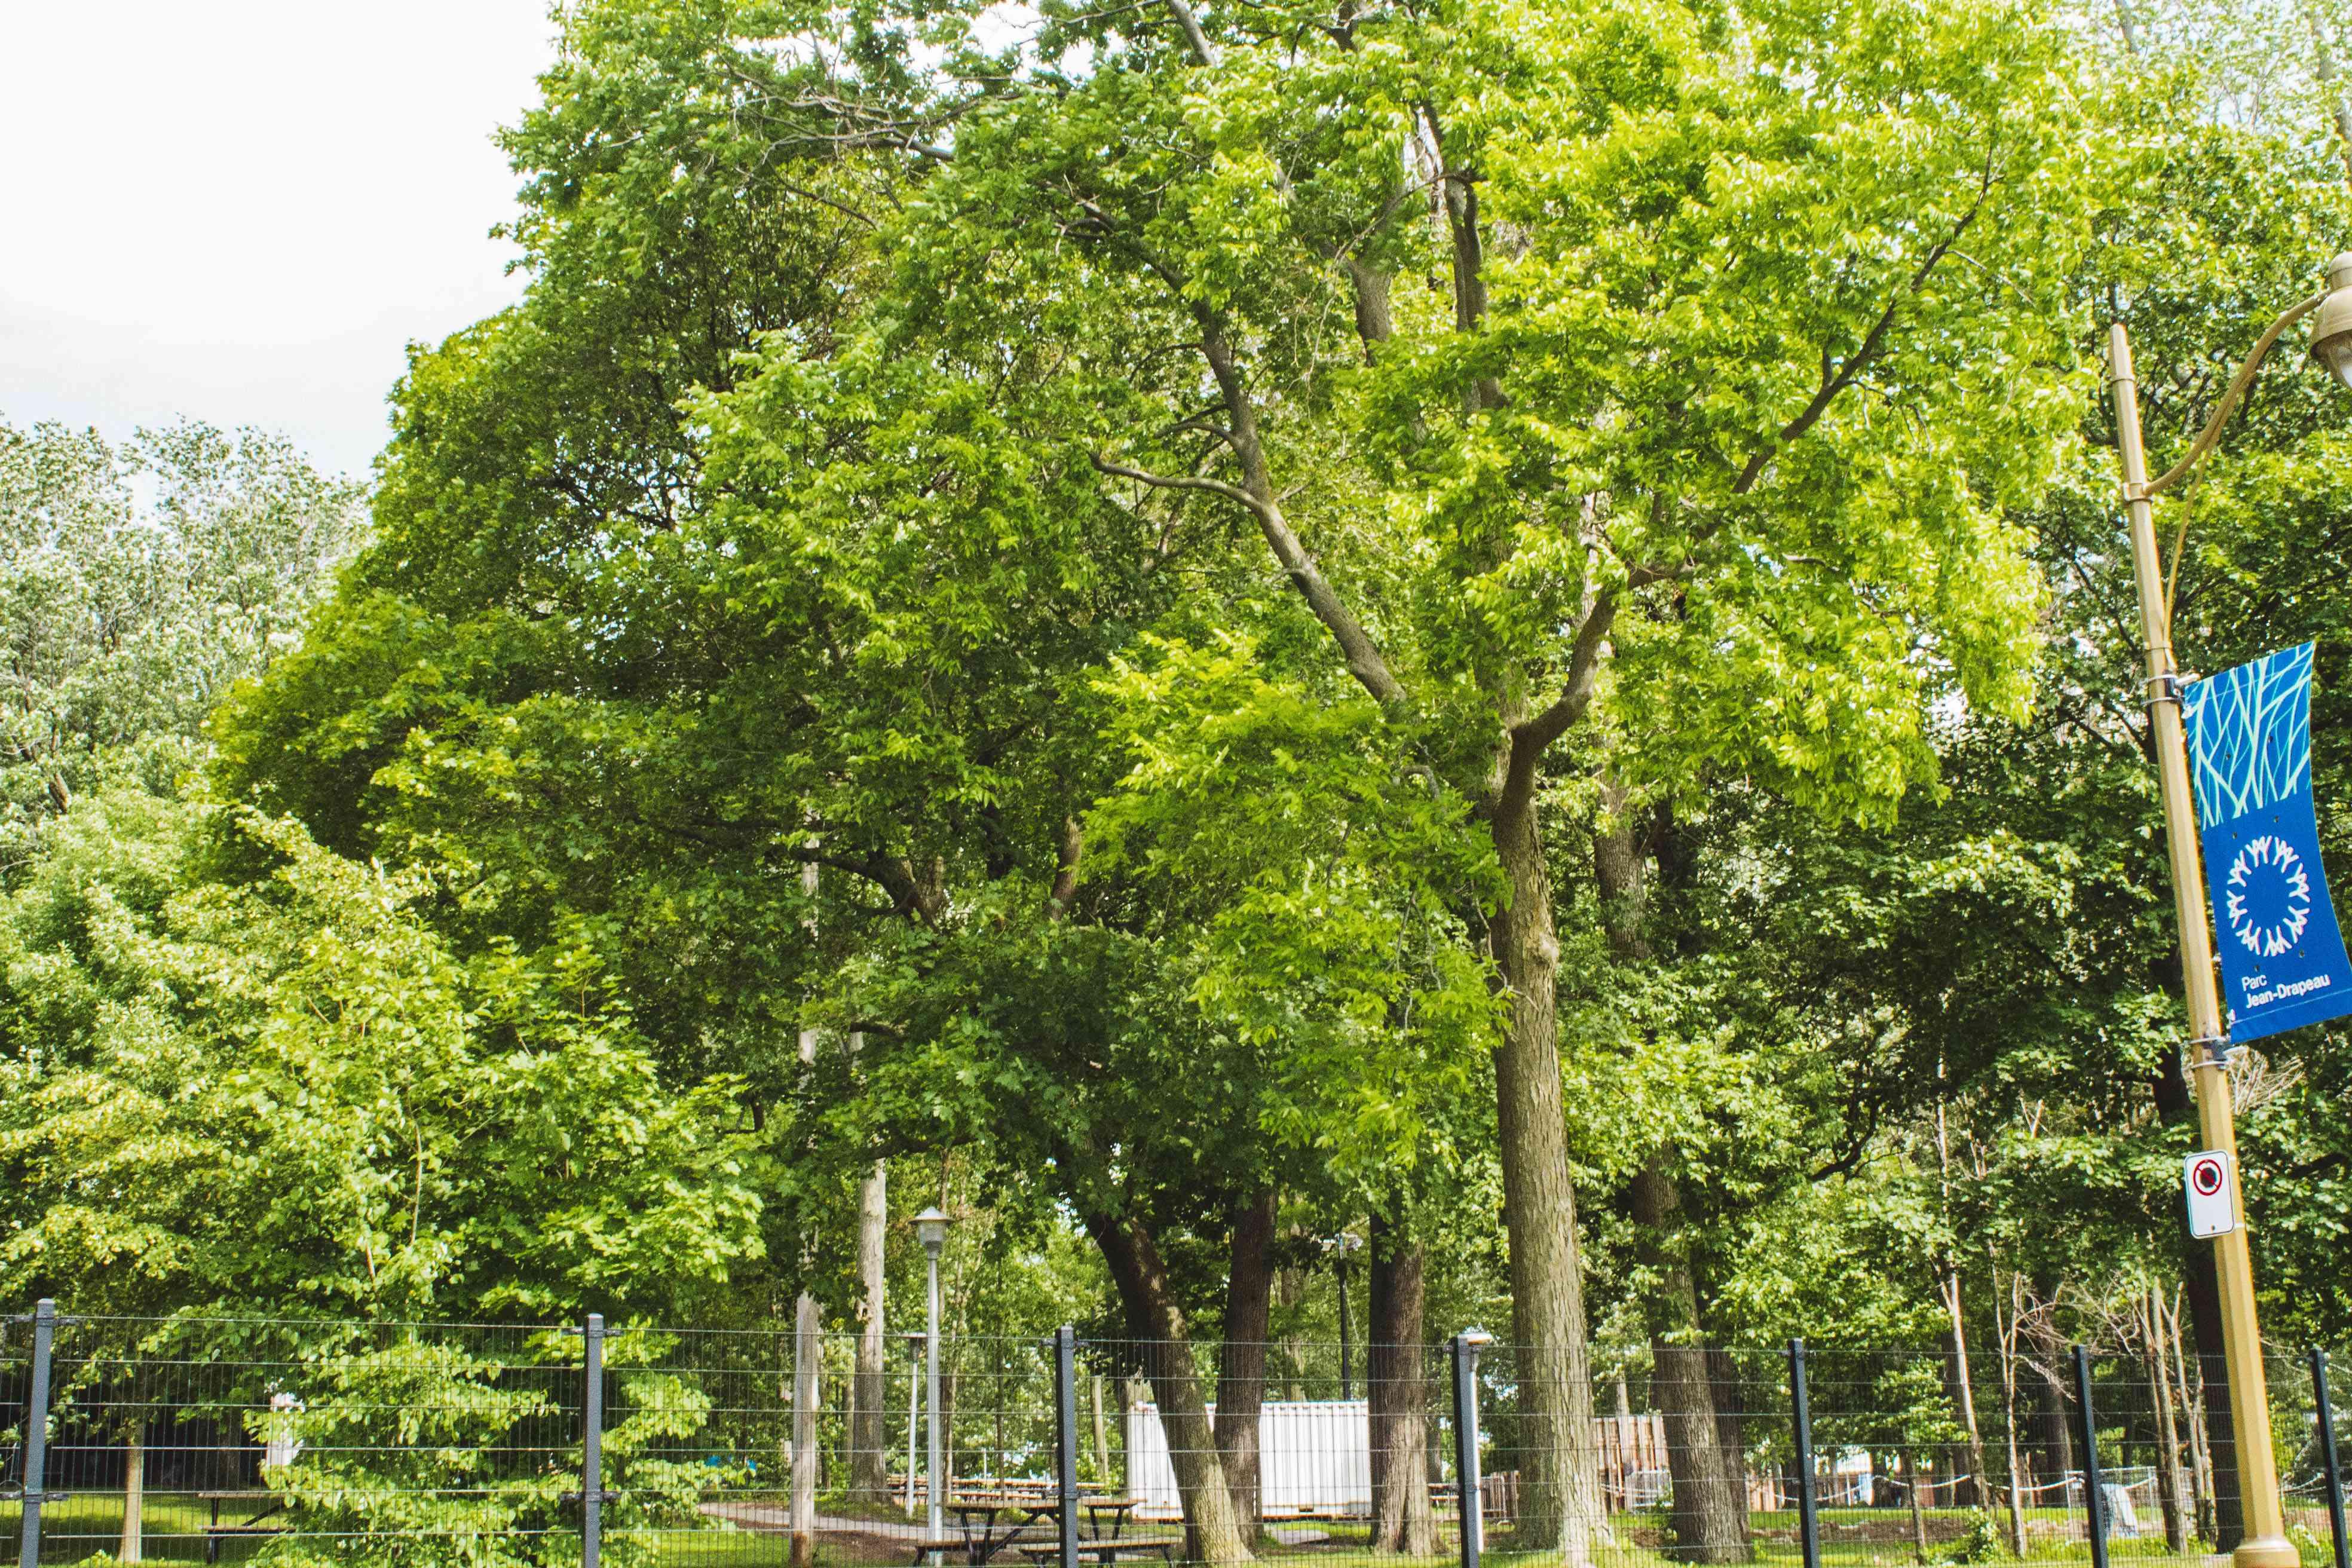 Parc Jean-Drapeau in Montreal